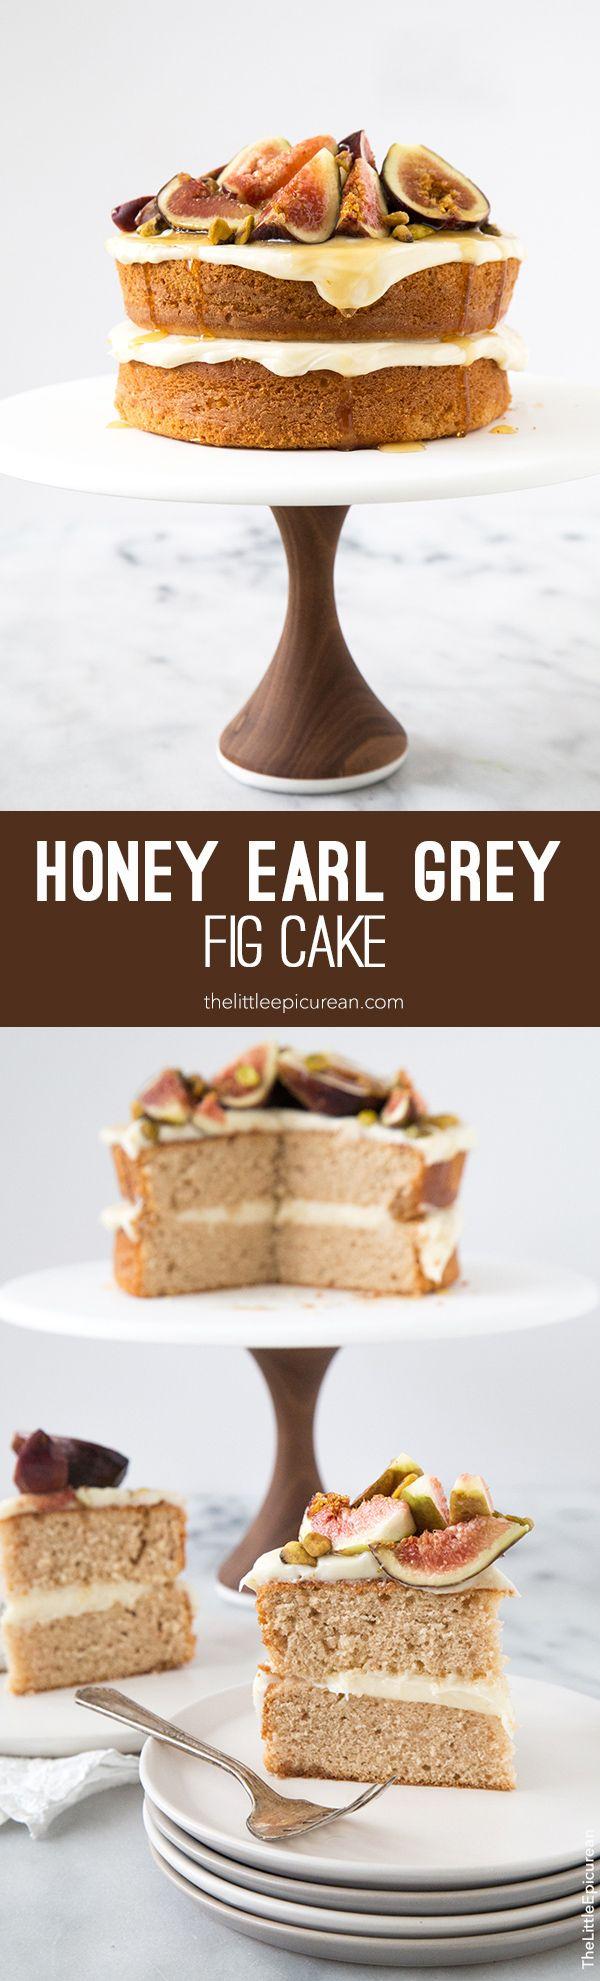 Honey Earl Grey Fig Cake- The Little Epicurean